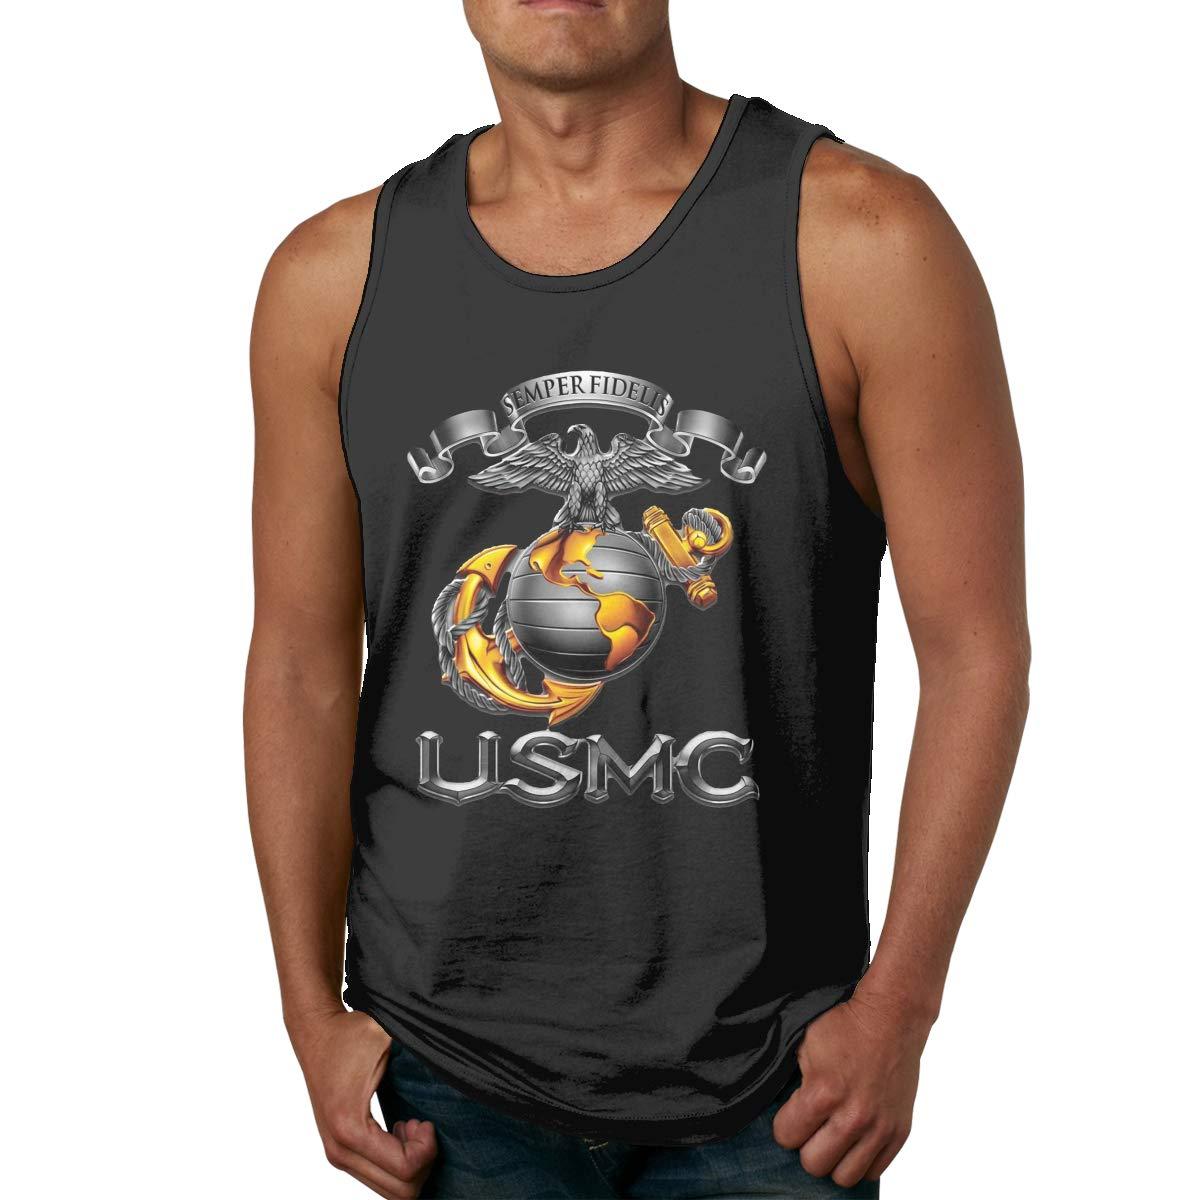 FKAHQ USMC Semper Fidelis Patriotic Mens Printed Vest Sports Tank-Top Tee Leisure Sleeveless T Shirt